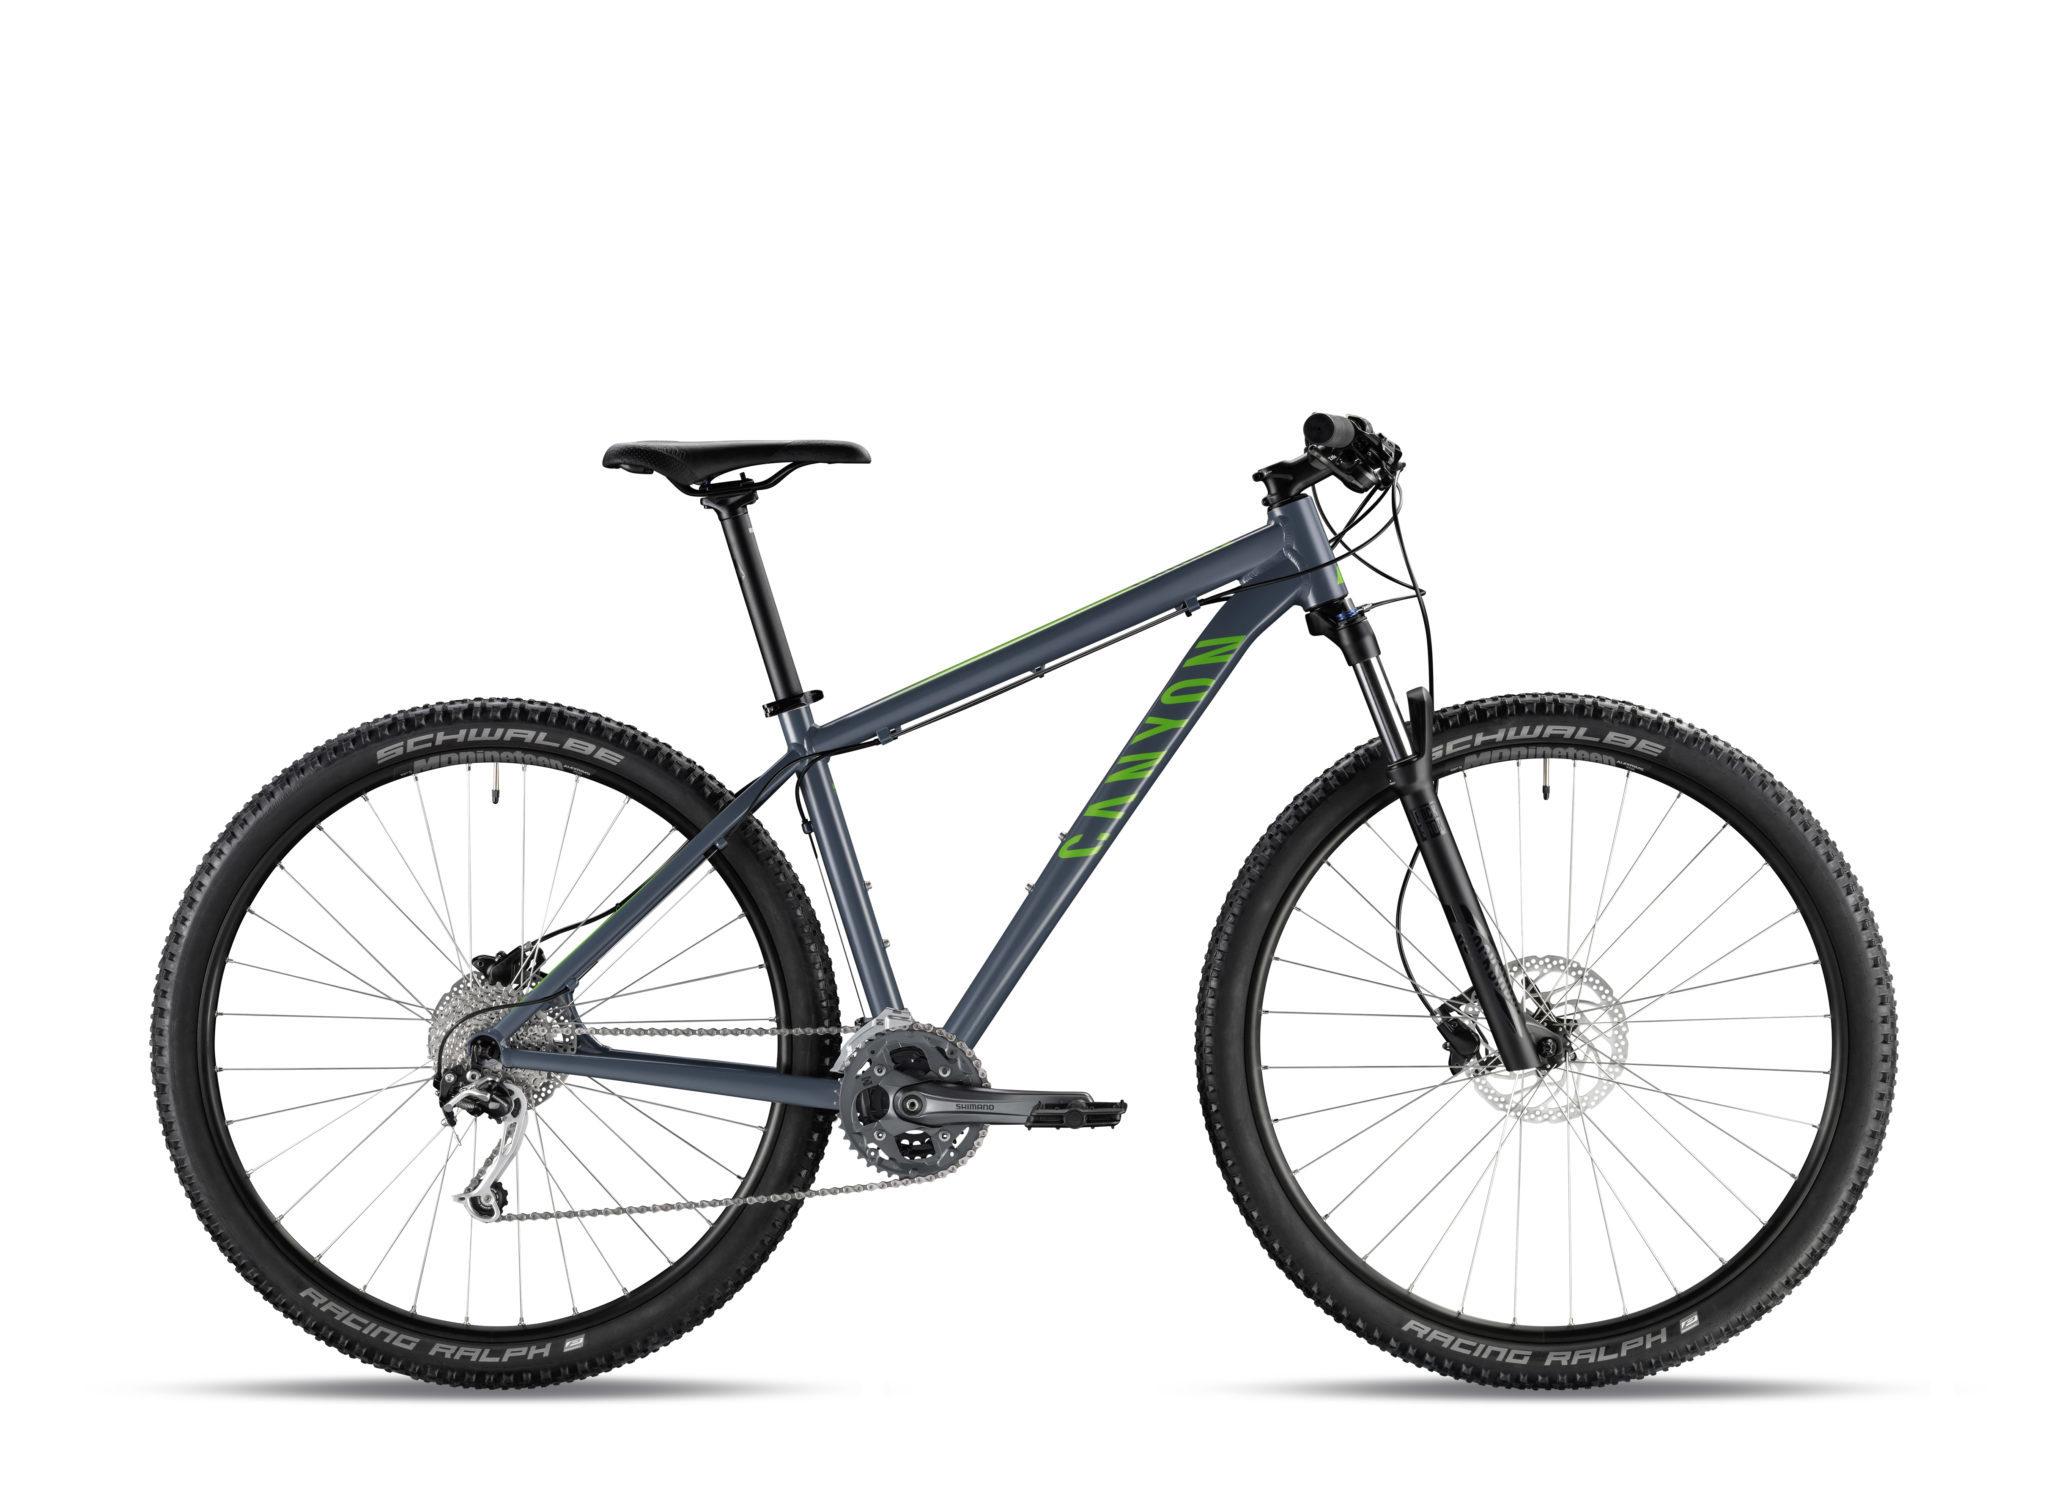 bicicleta da Lisbon bike rentals